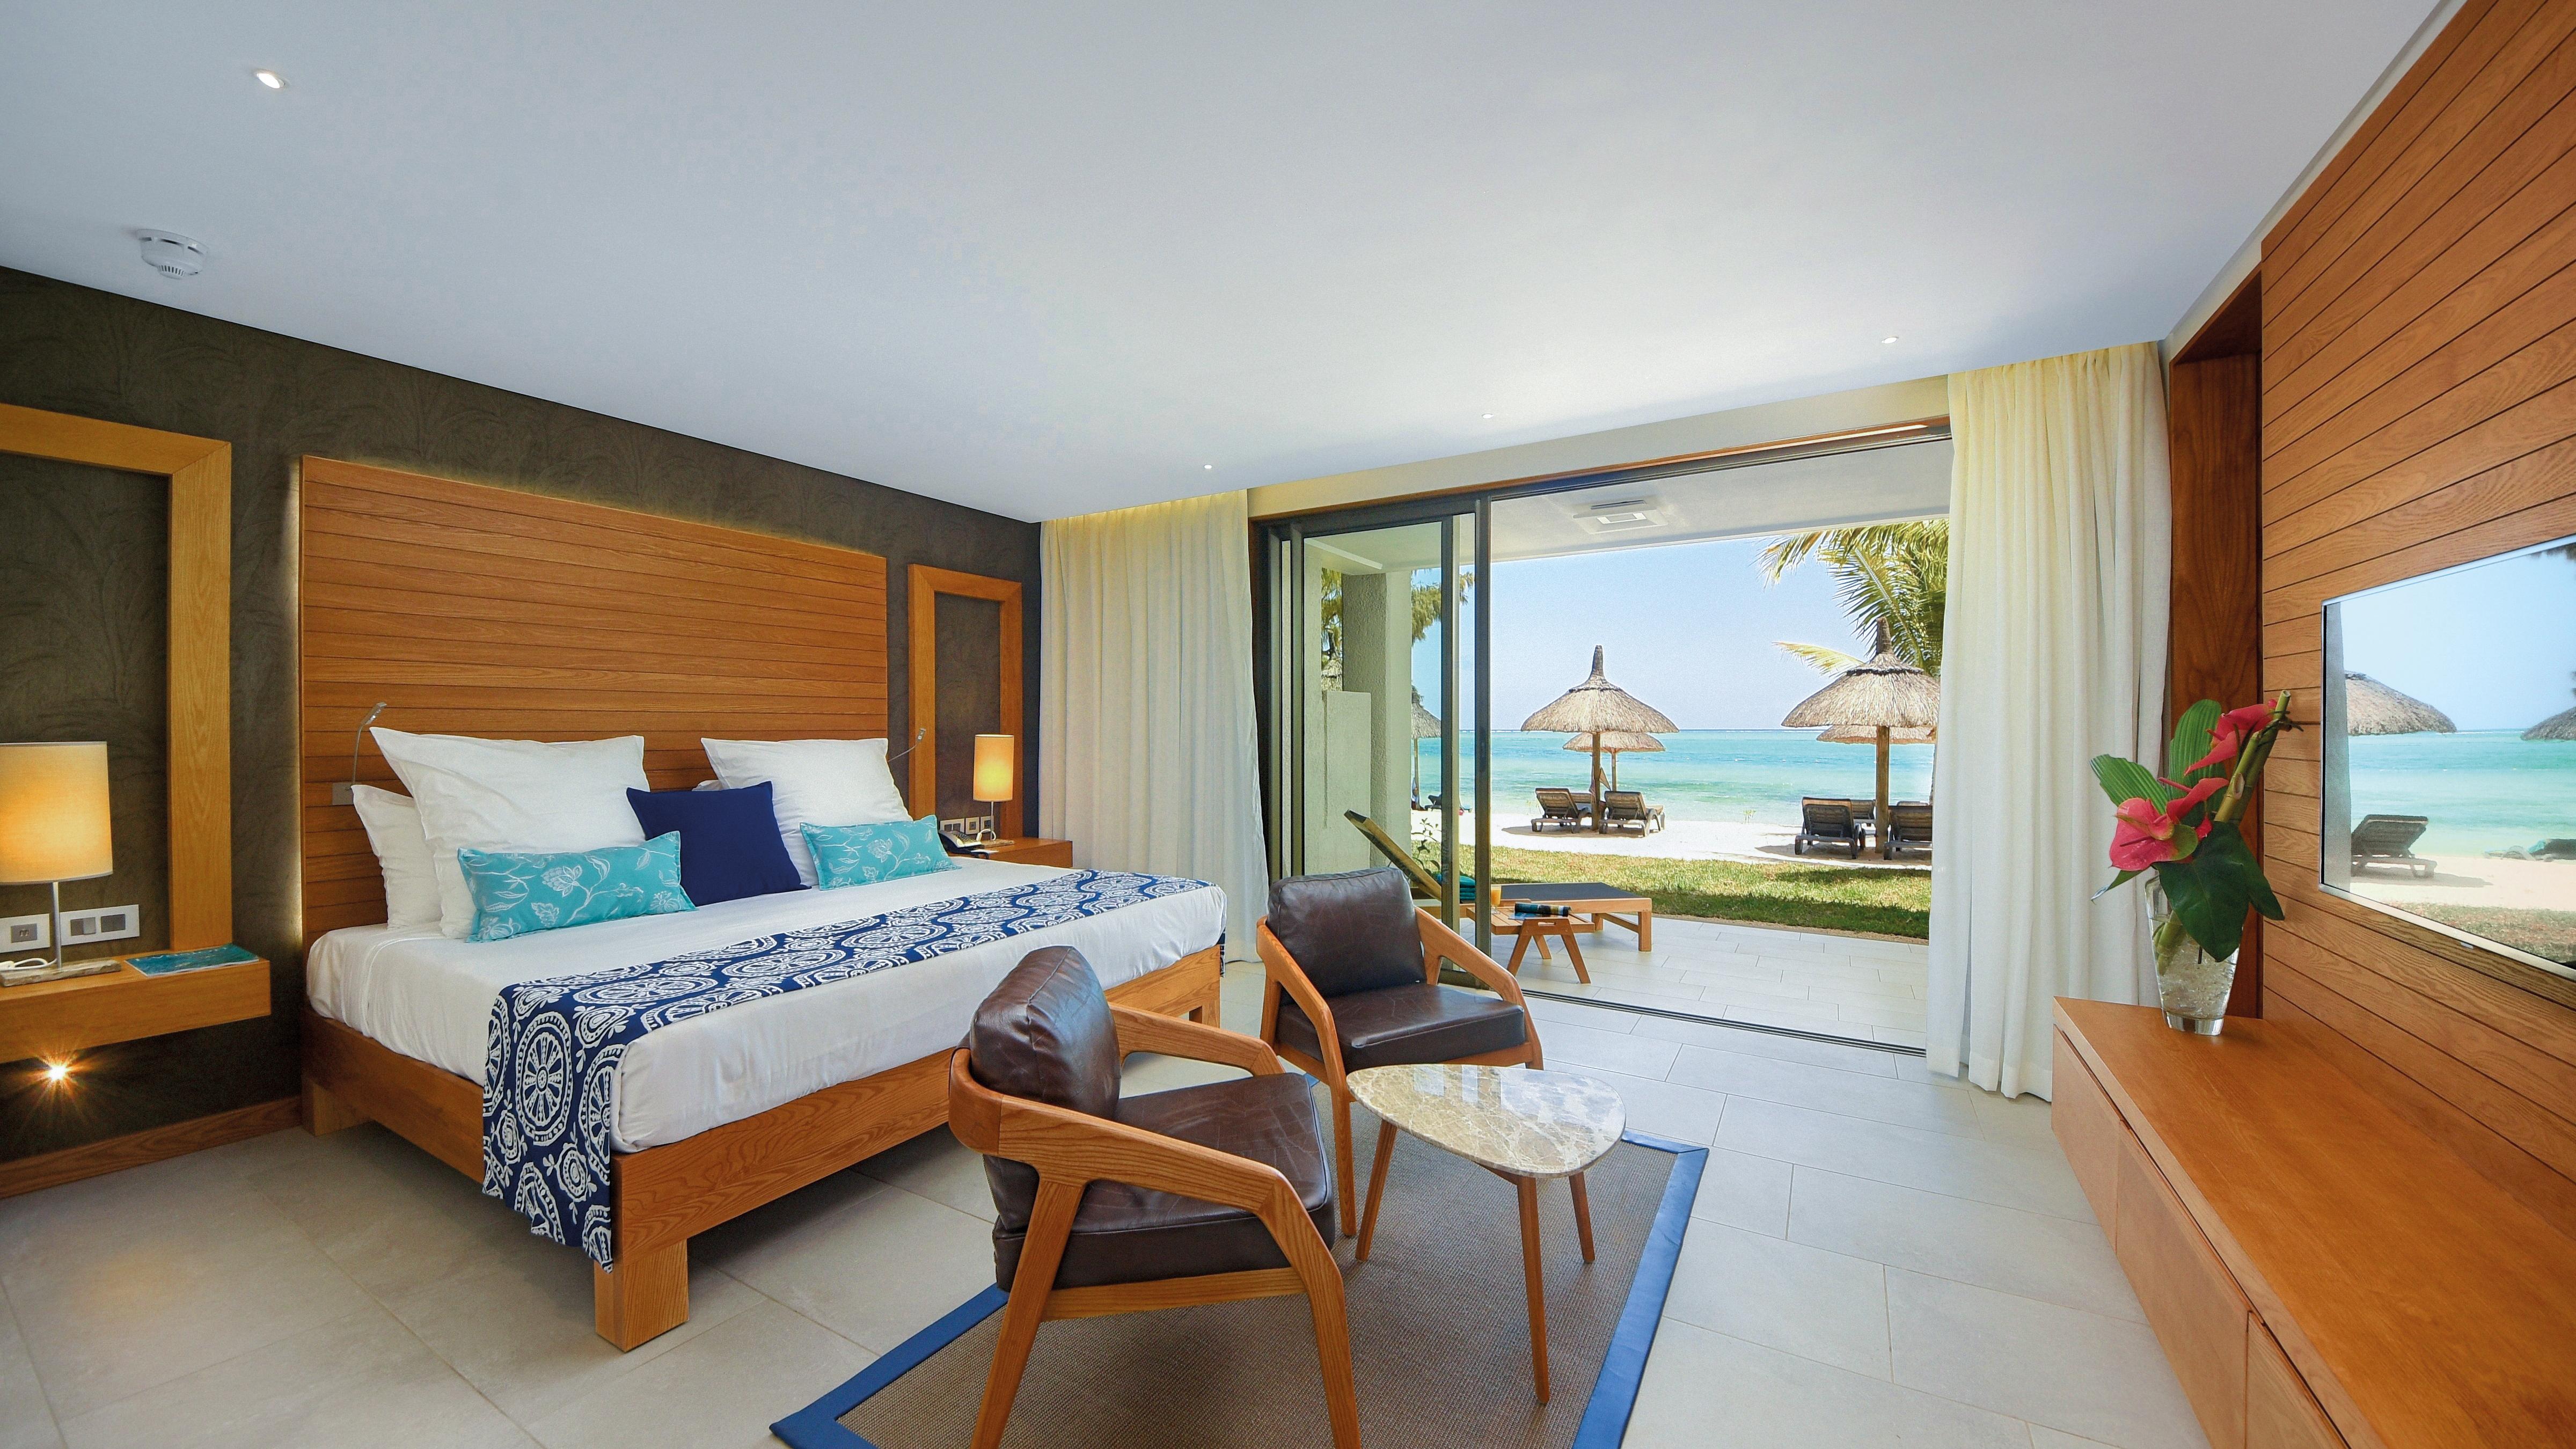 paradis-beachcomber-mauritius